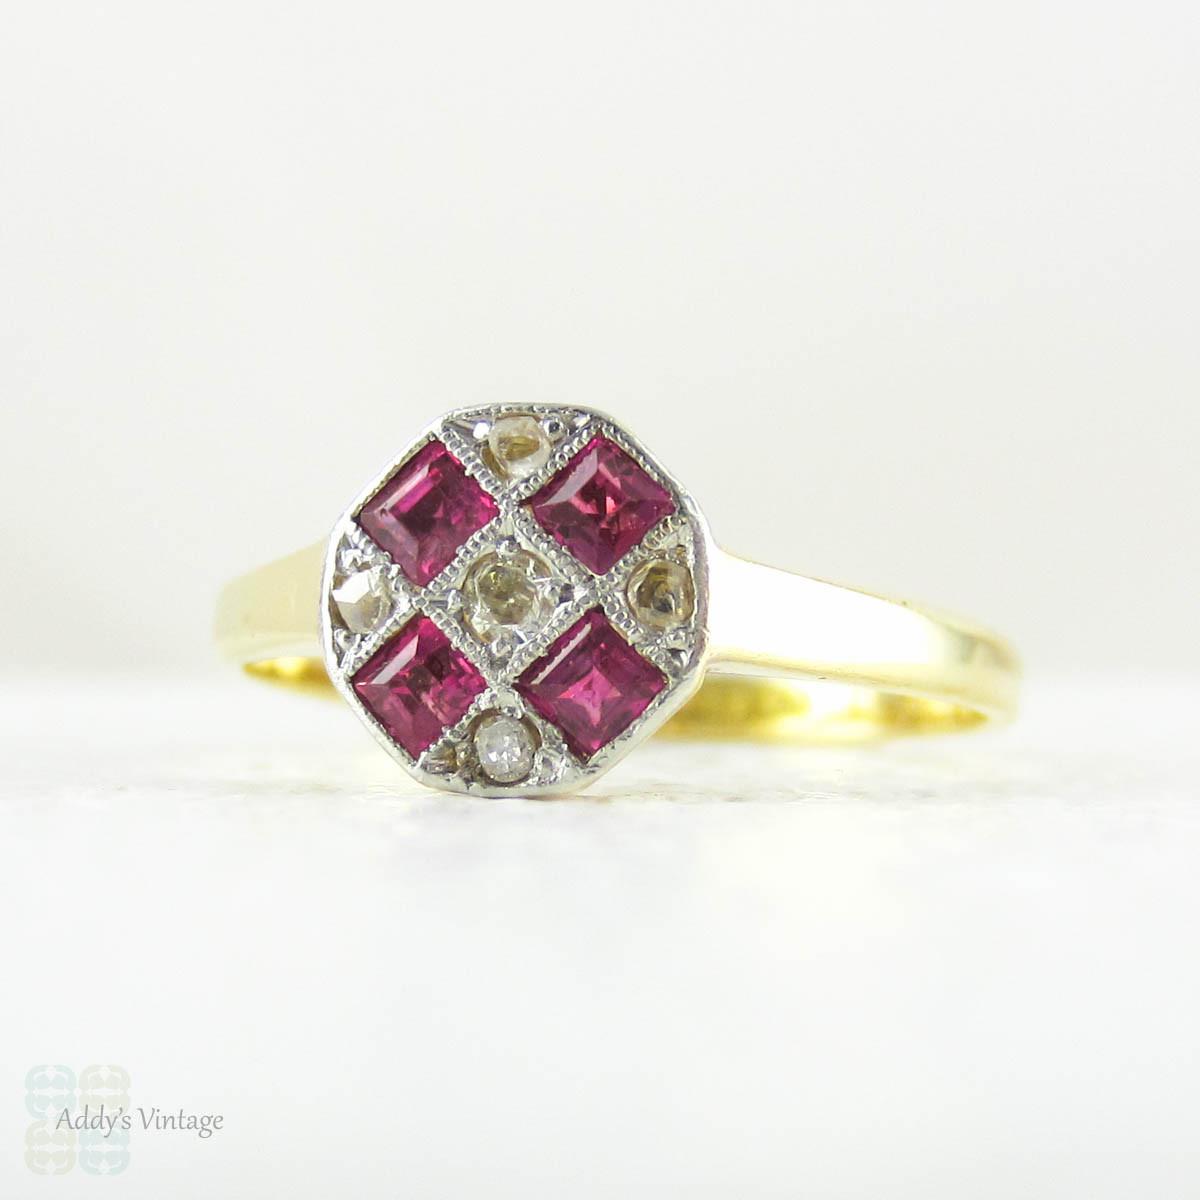 Vintage Ruby Amp Diamond Engagement Ring Square Cut Pinkish